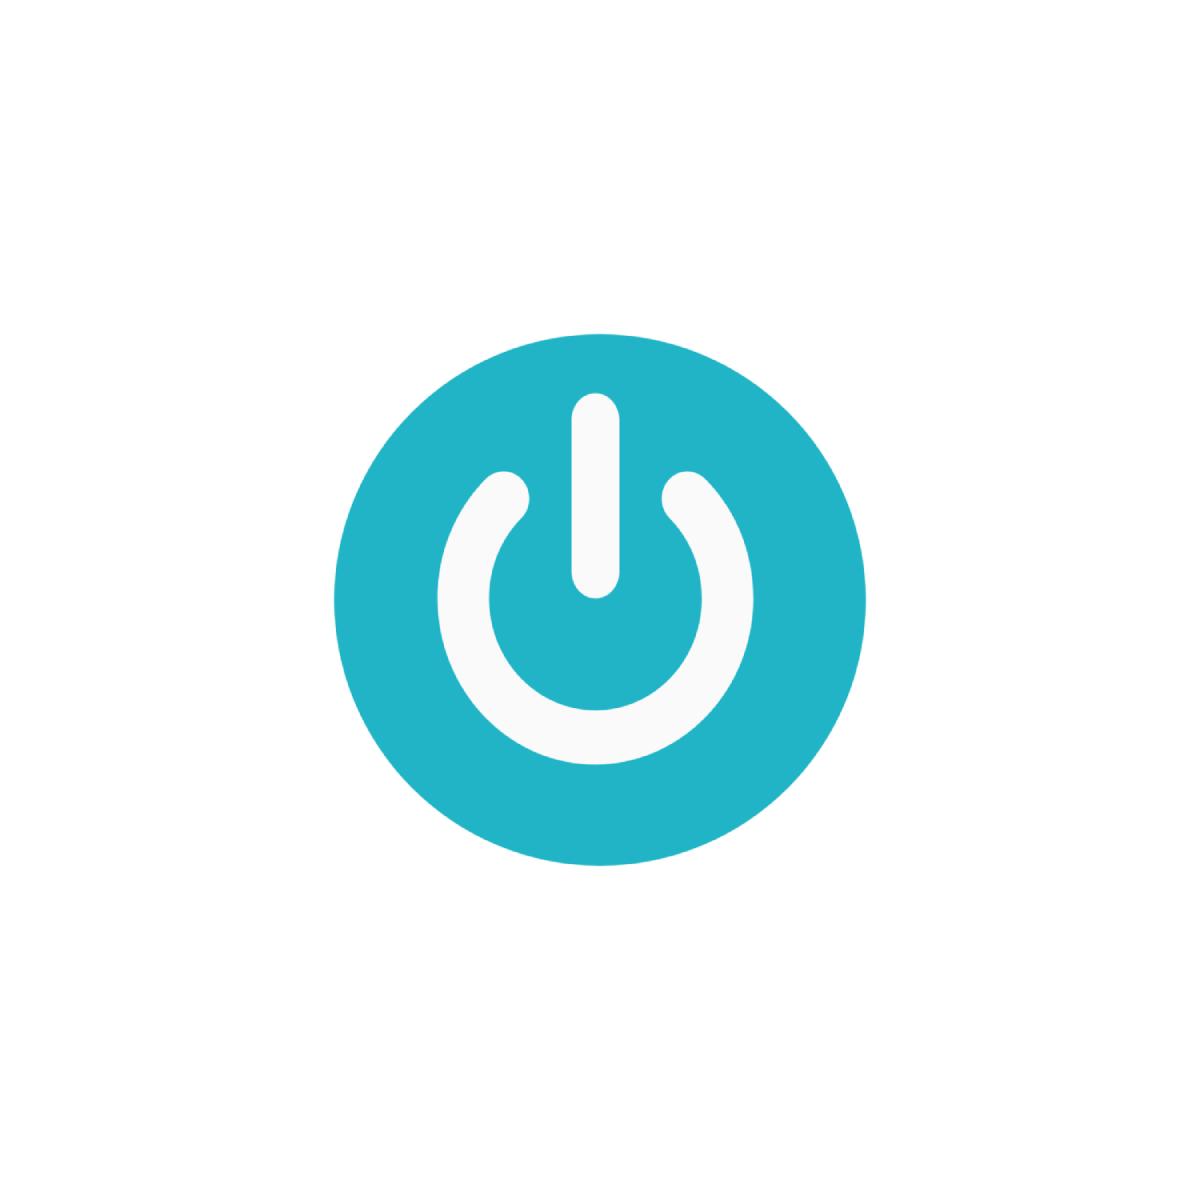 Tek.no Tester, guider, teknologi